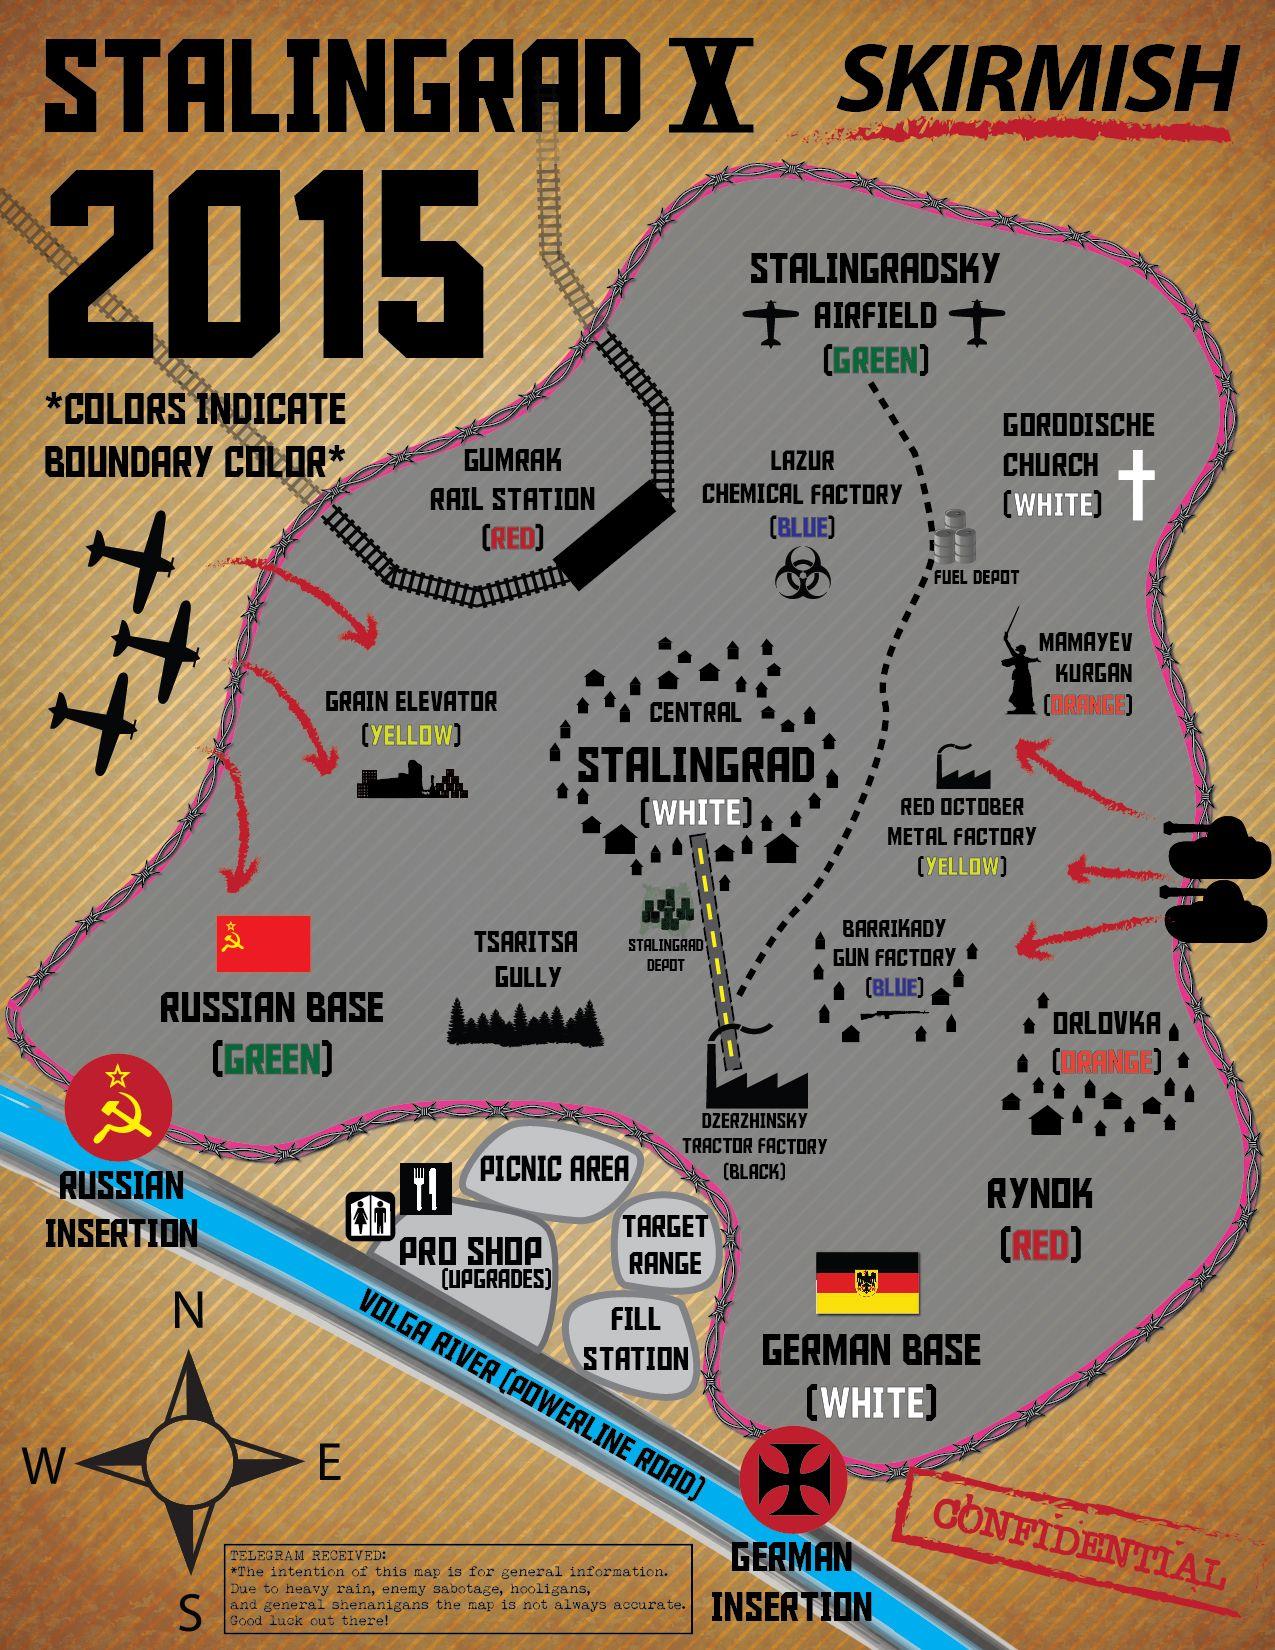 Skirmish Paintball Stalingrad 2015 Map kicks off